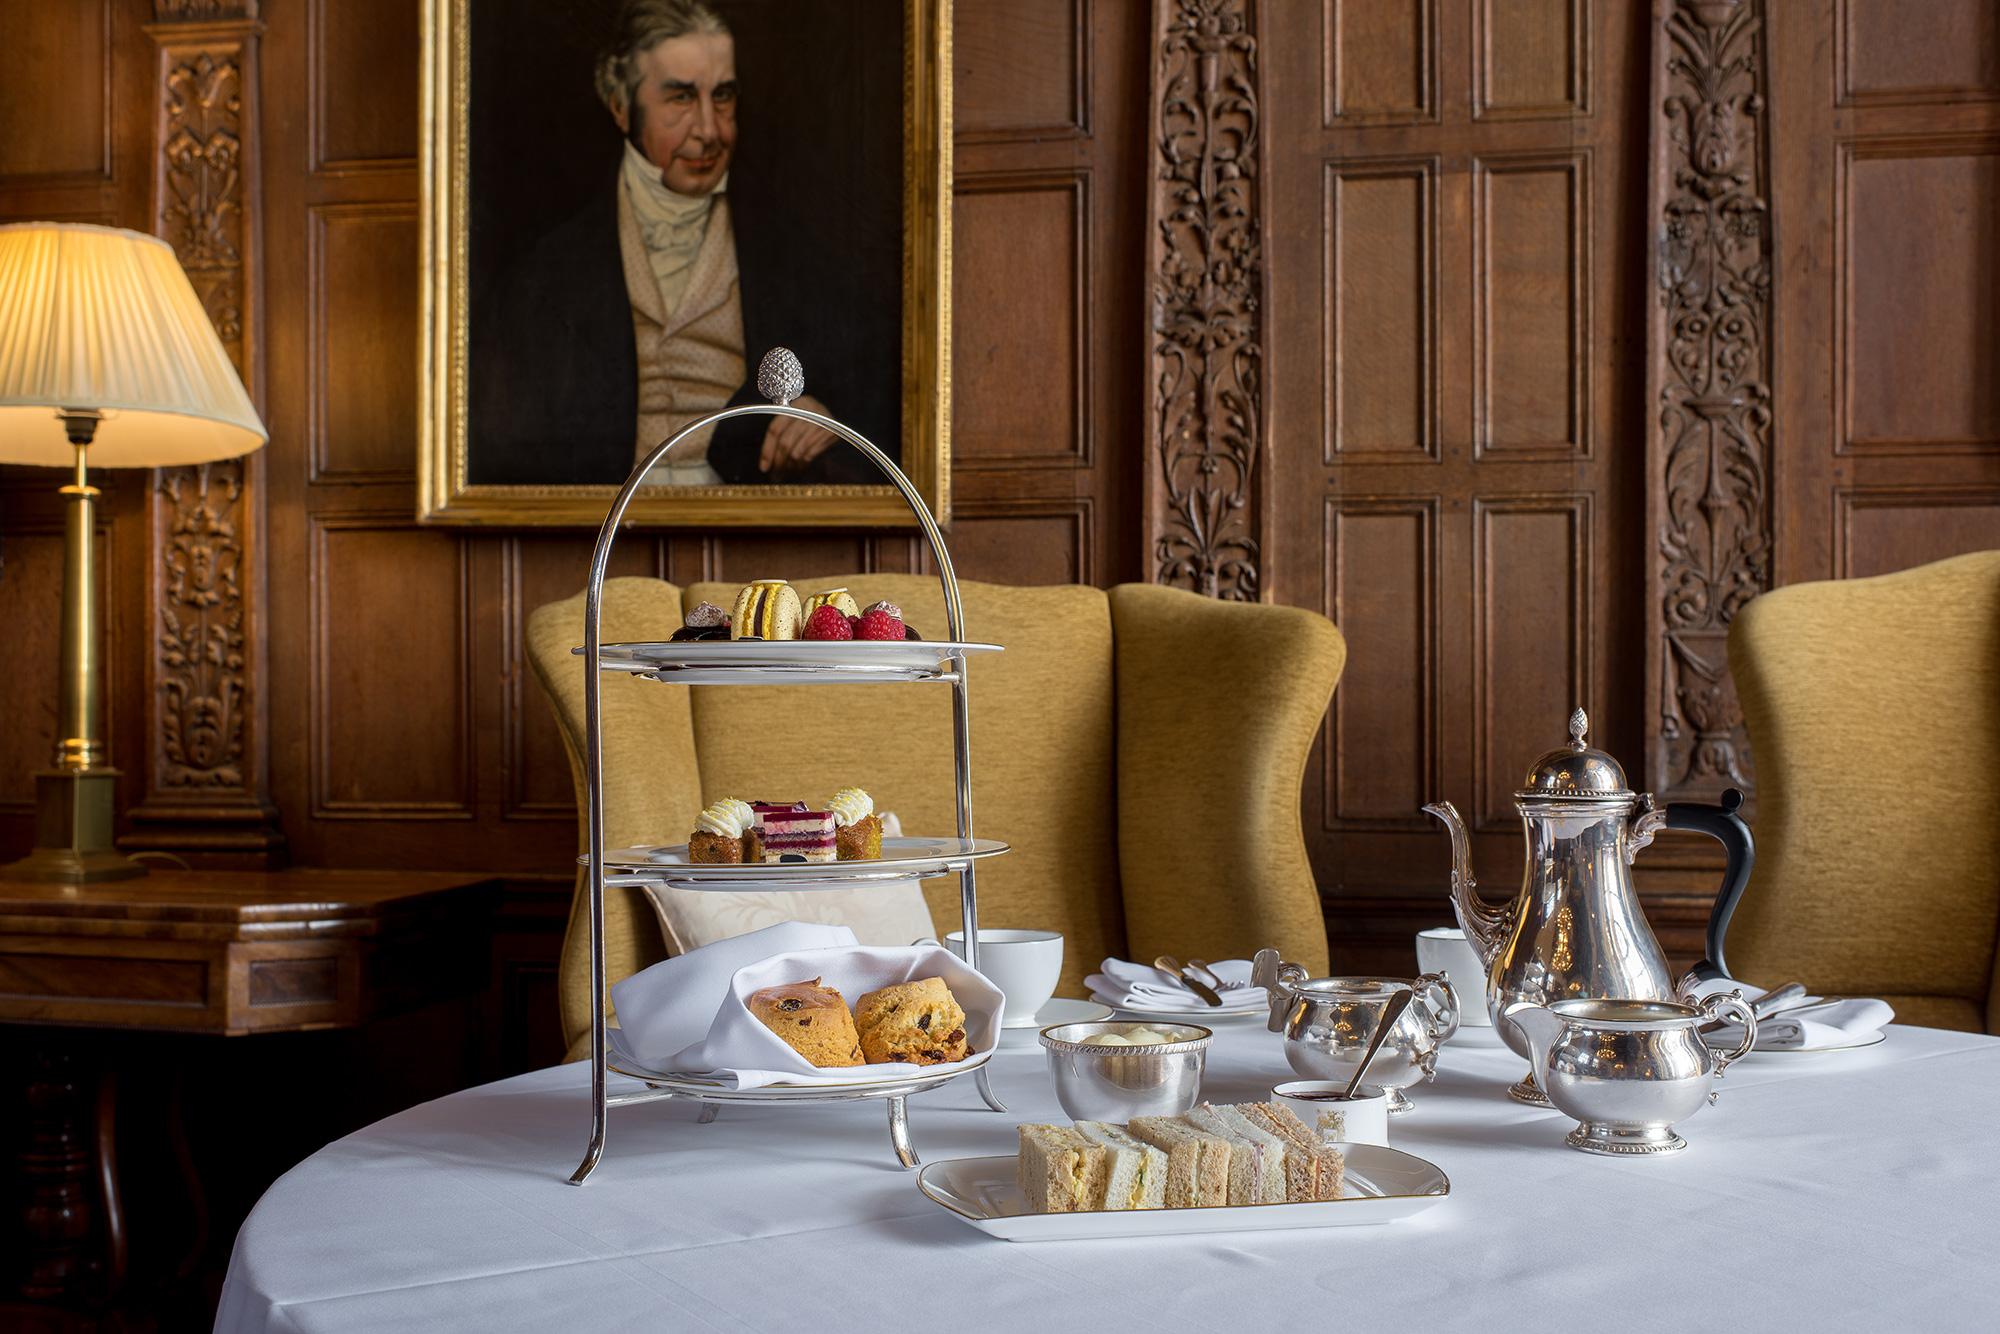 hotel-cream-tea-photography.jpg